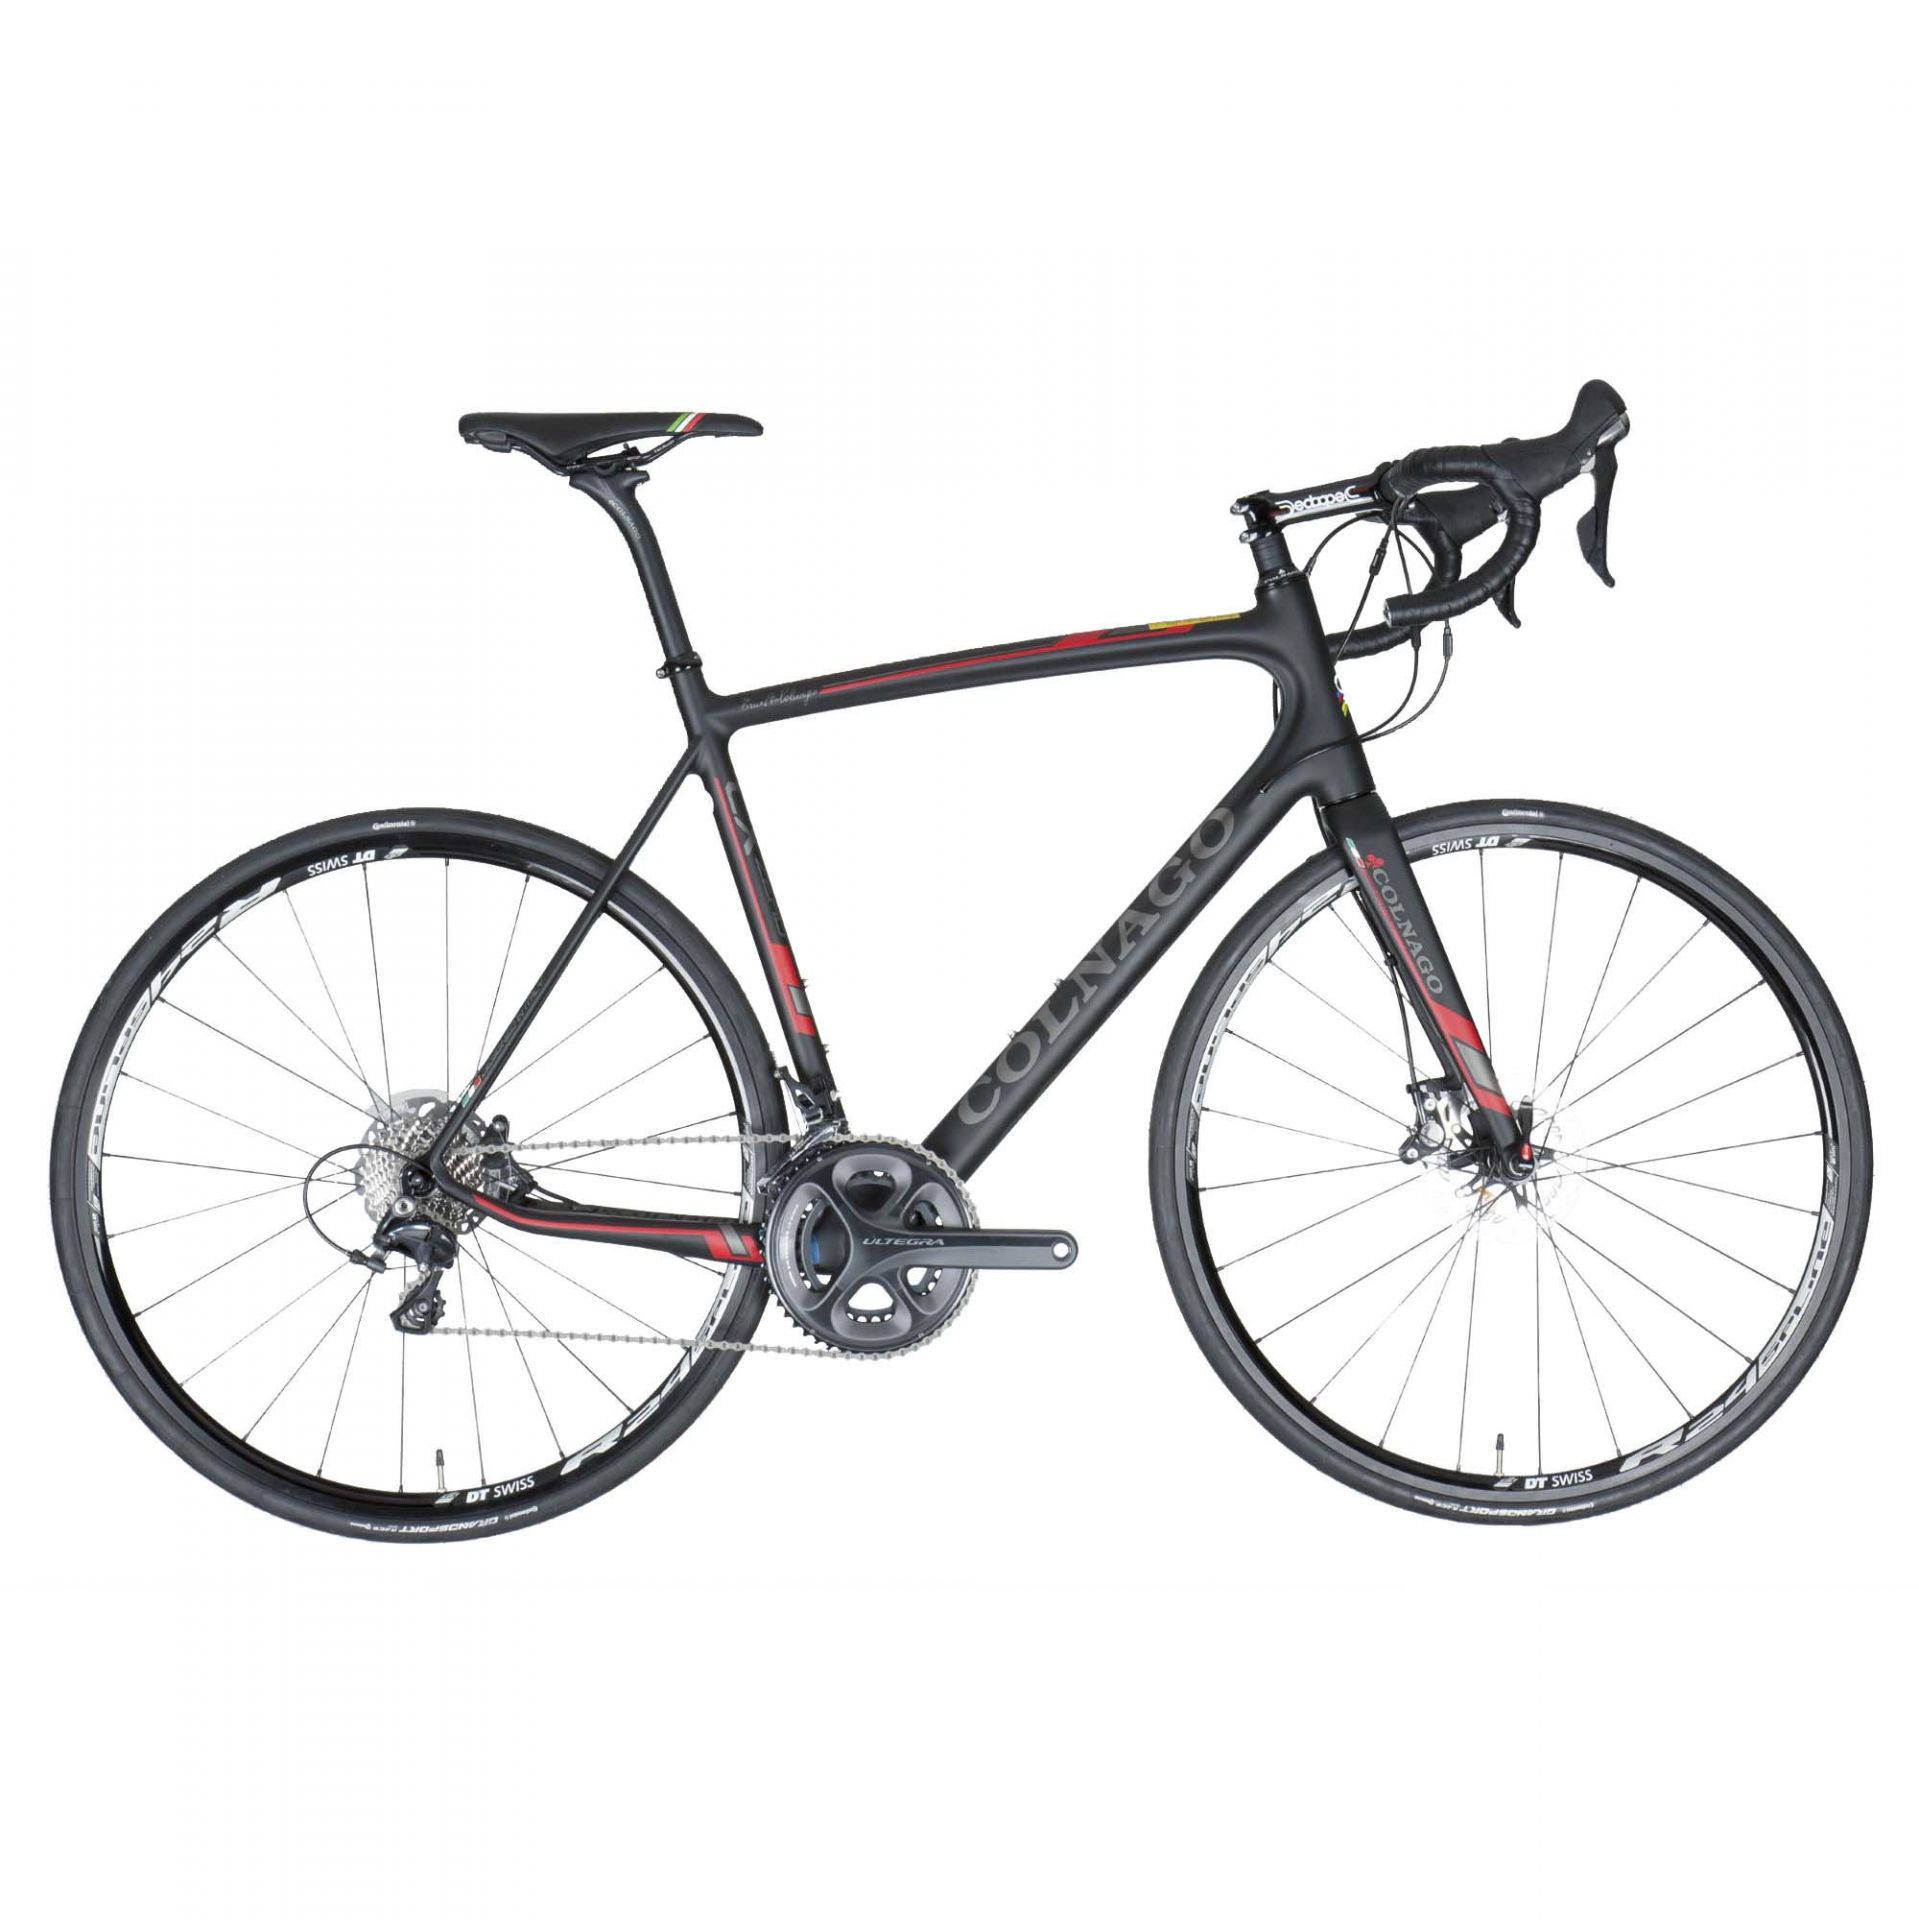 Vélo Colnago CX Zero Disc Ultegra 11V DT Swiss R24DB (LABR) 2015 - 540S